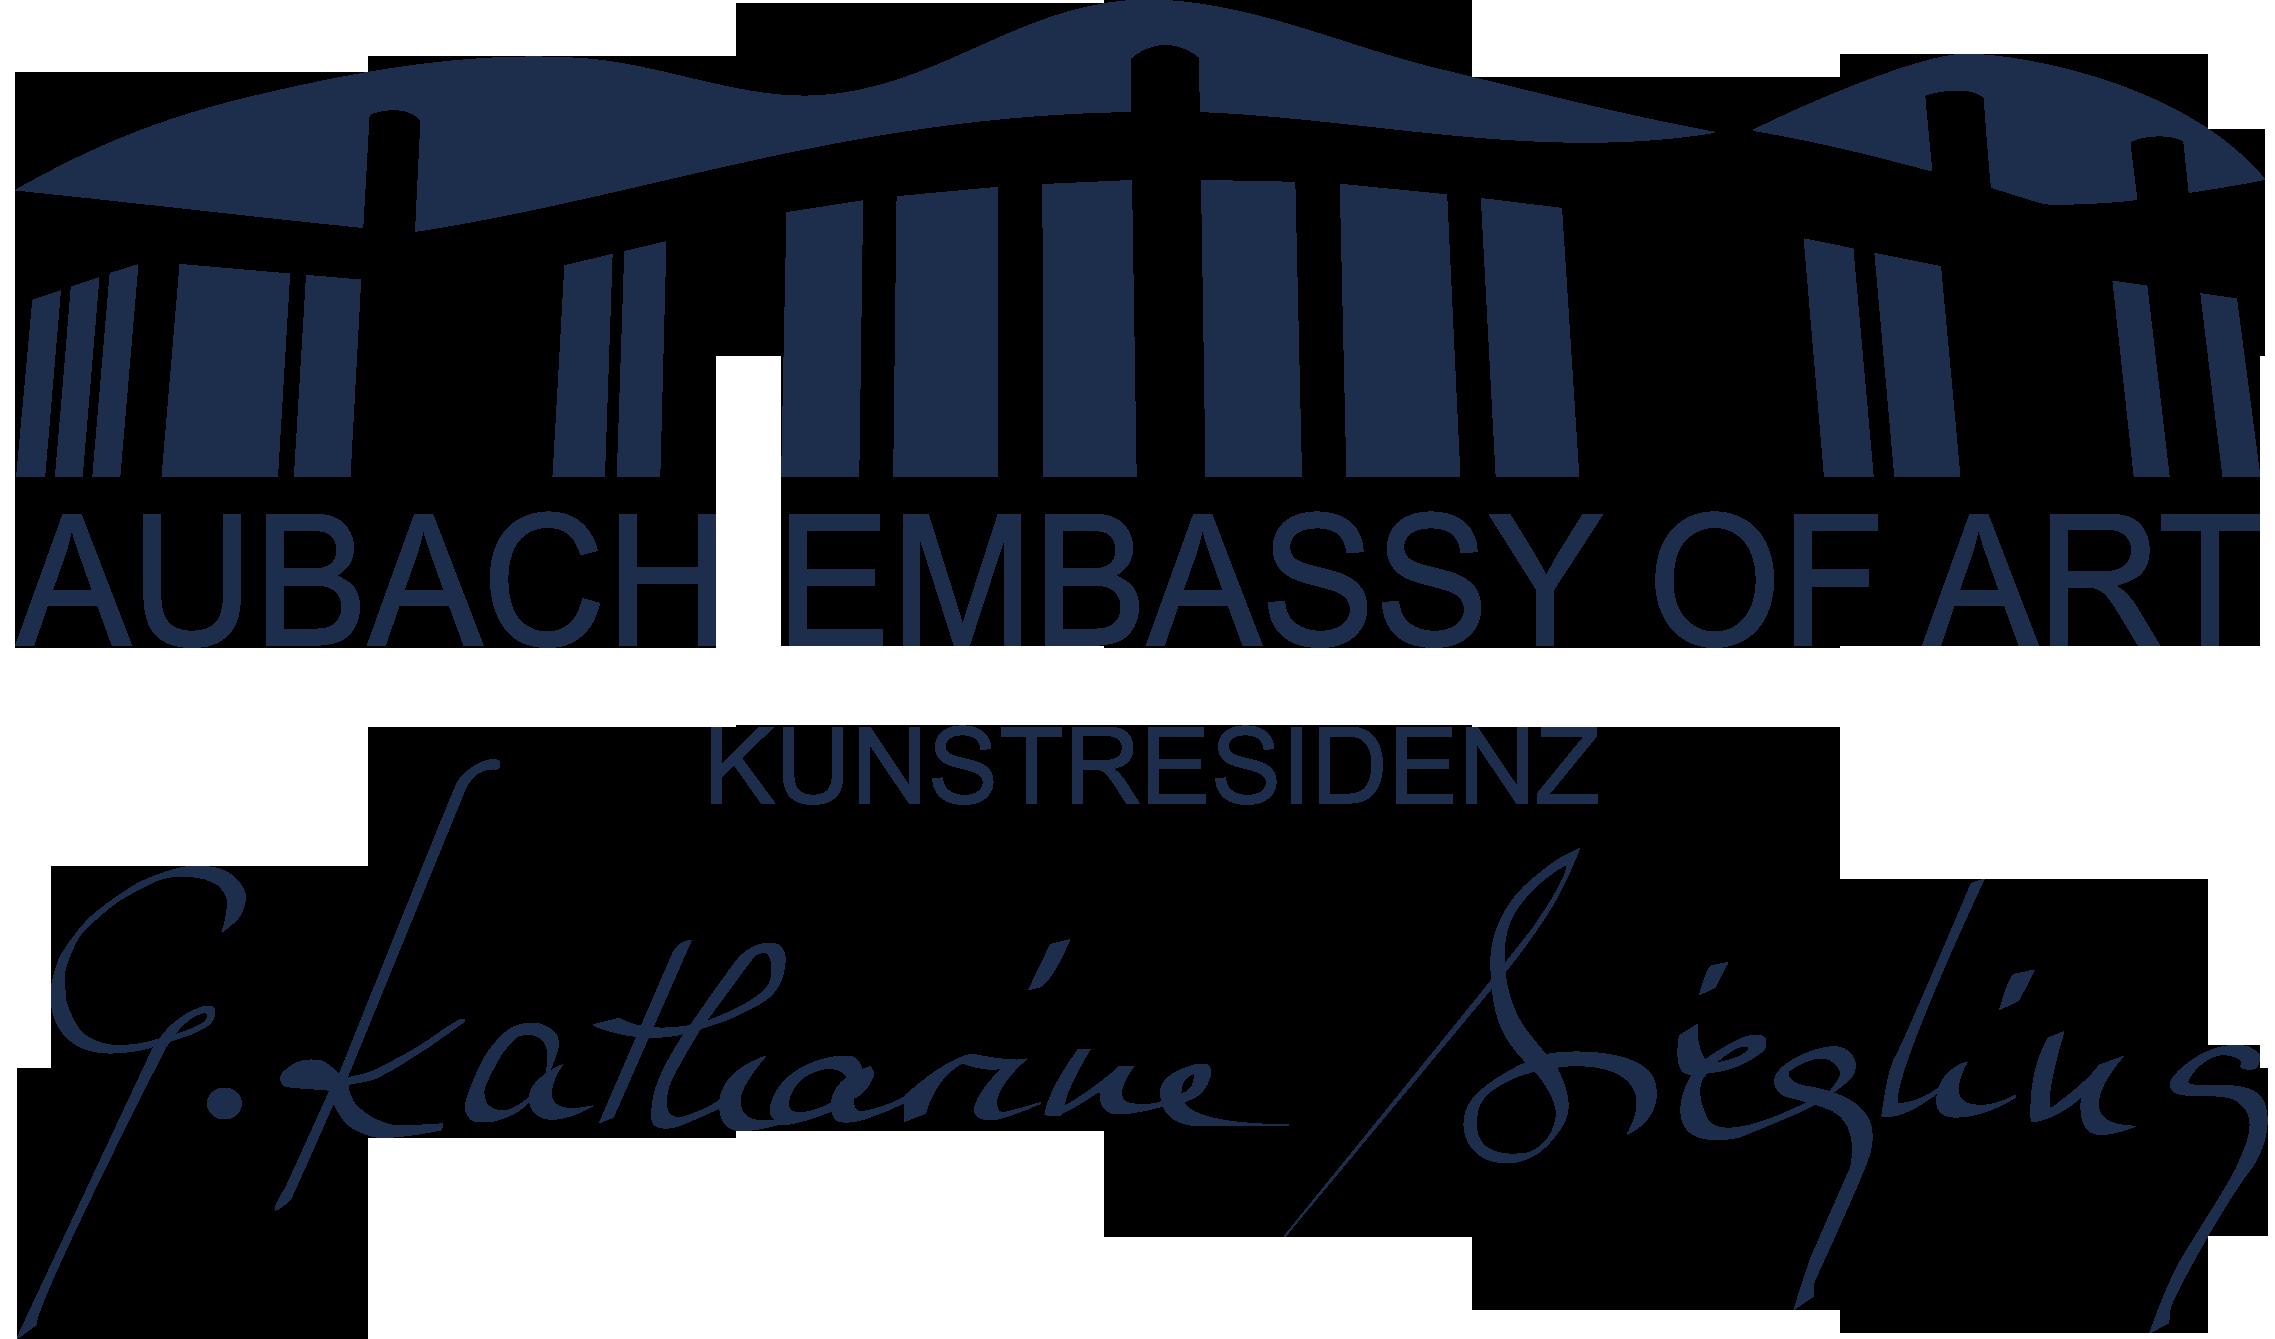 Aubach Embassy of Art – Kunstresidenz – Katharine Siegling